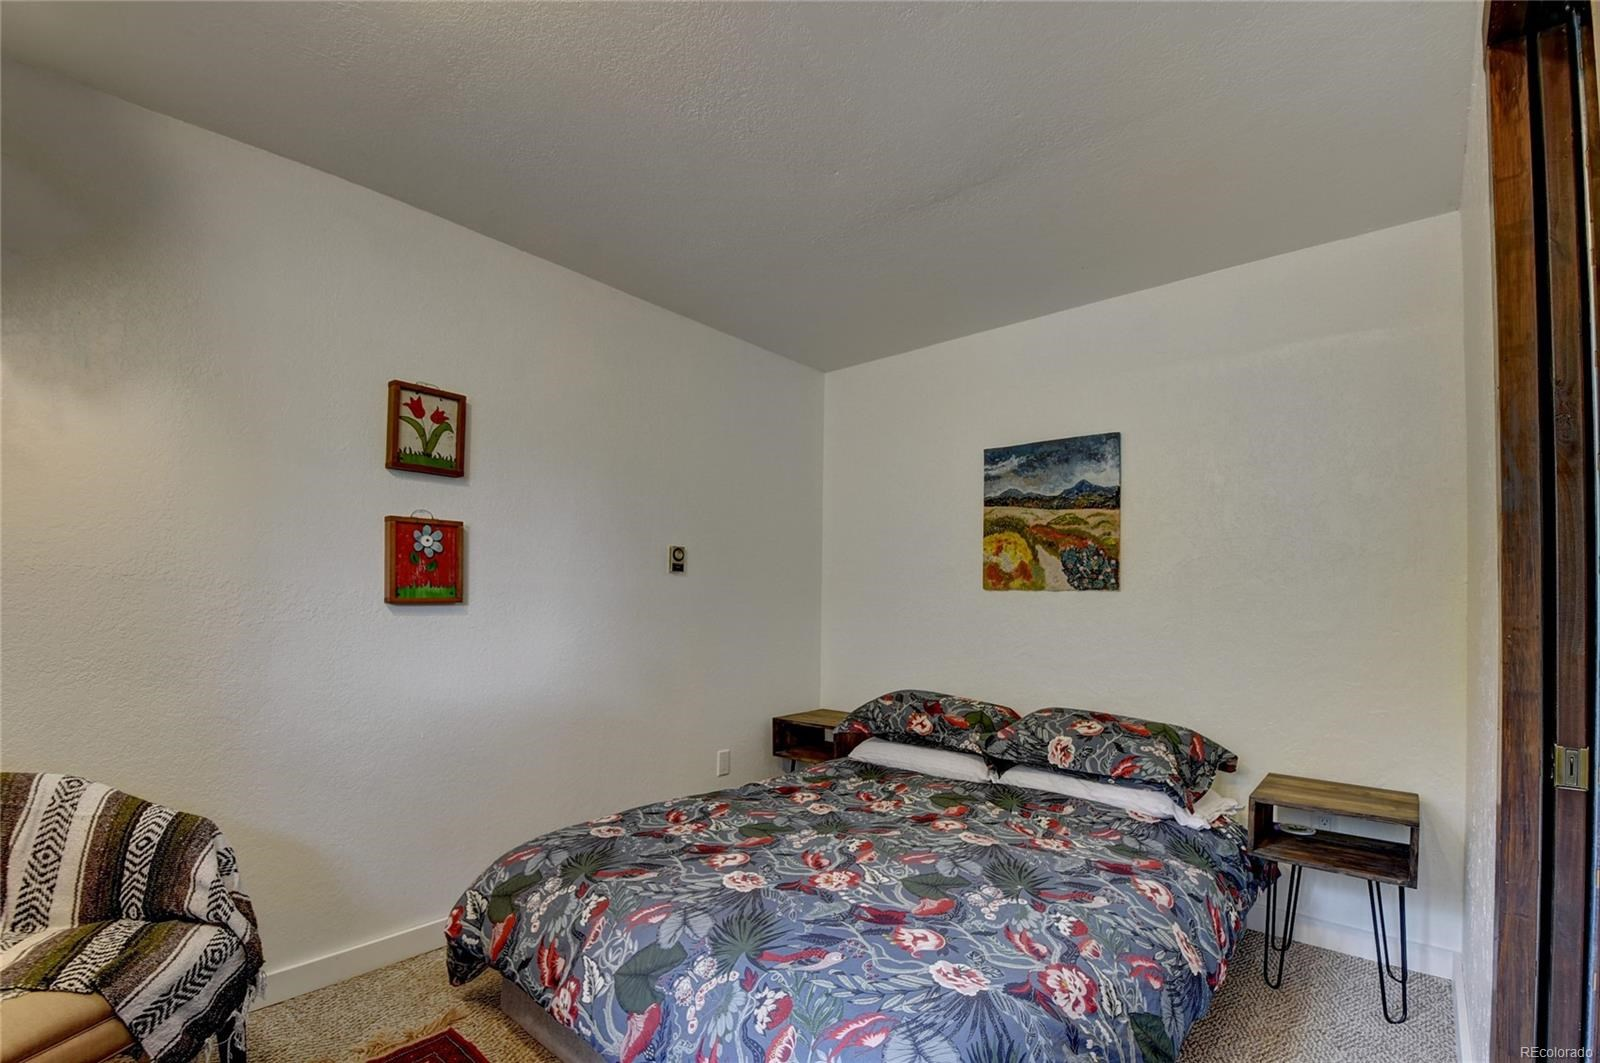 MLS# 7152312 - 27234  Armadillo Way, Evergreen, CO 80439